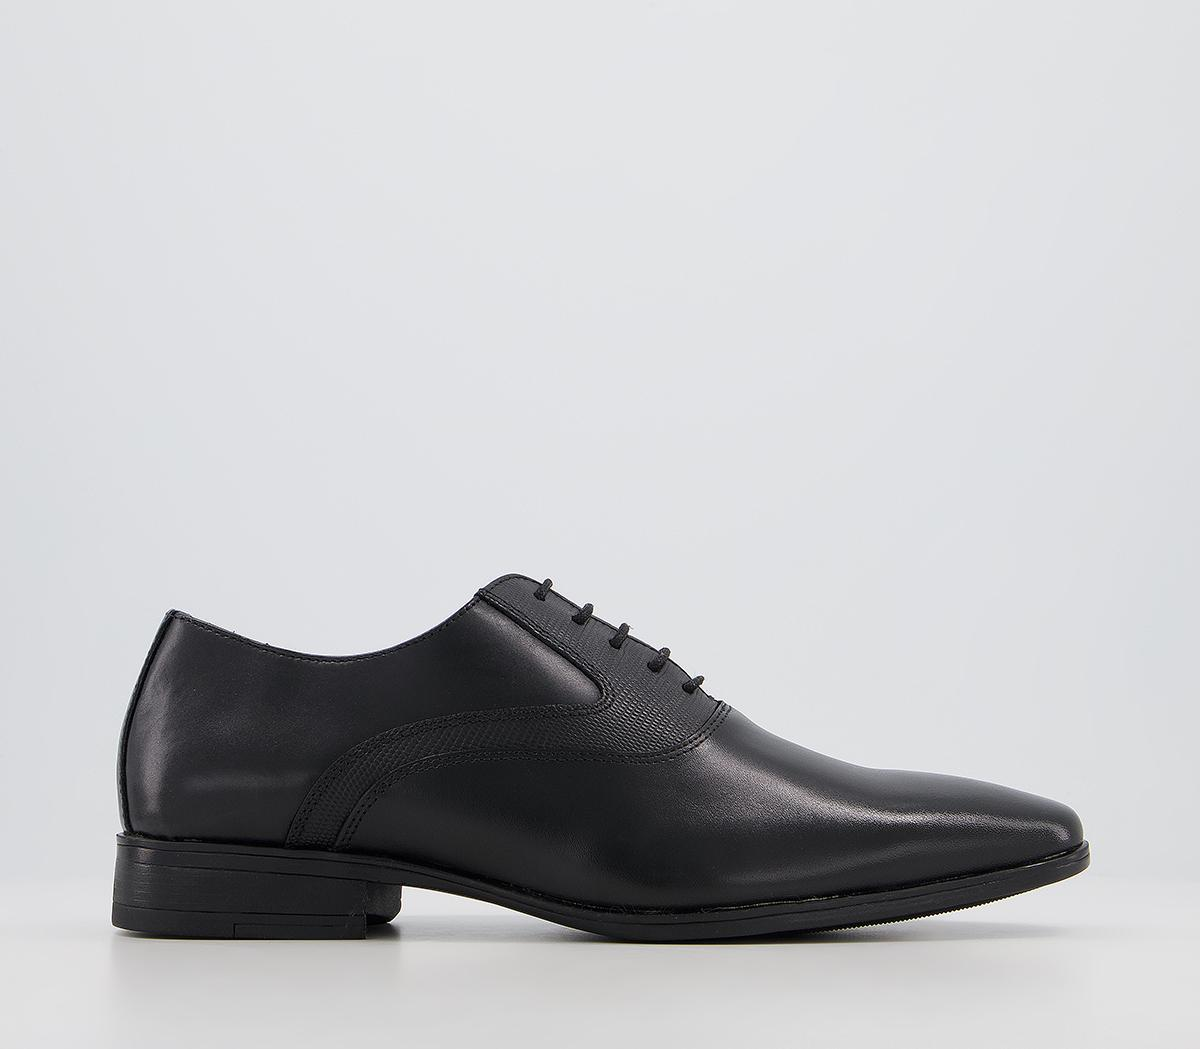 Manifest Toe Rose Oxford Shoes